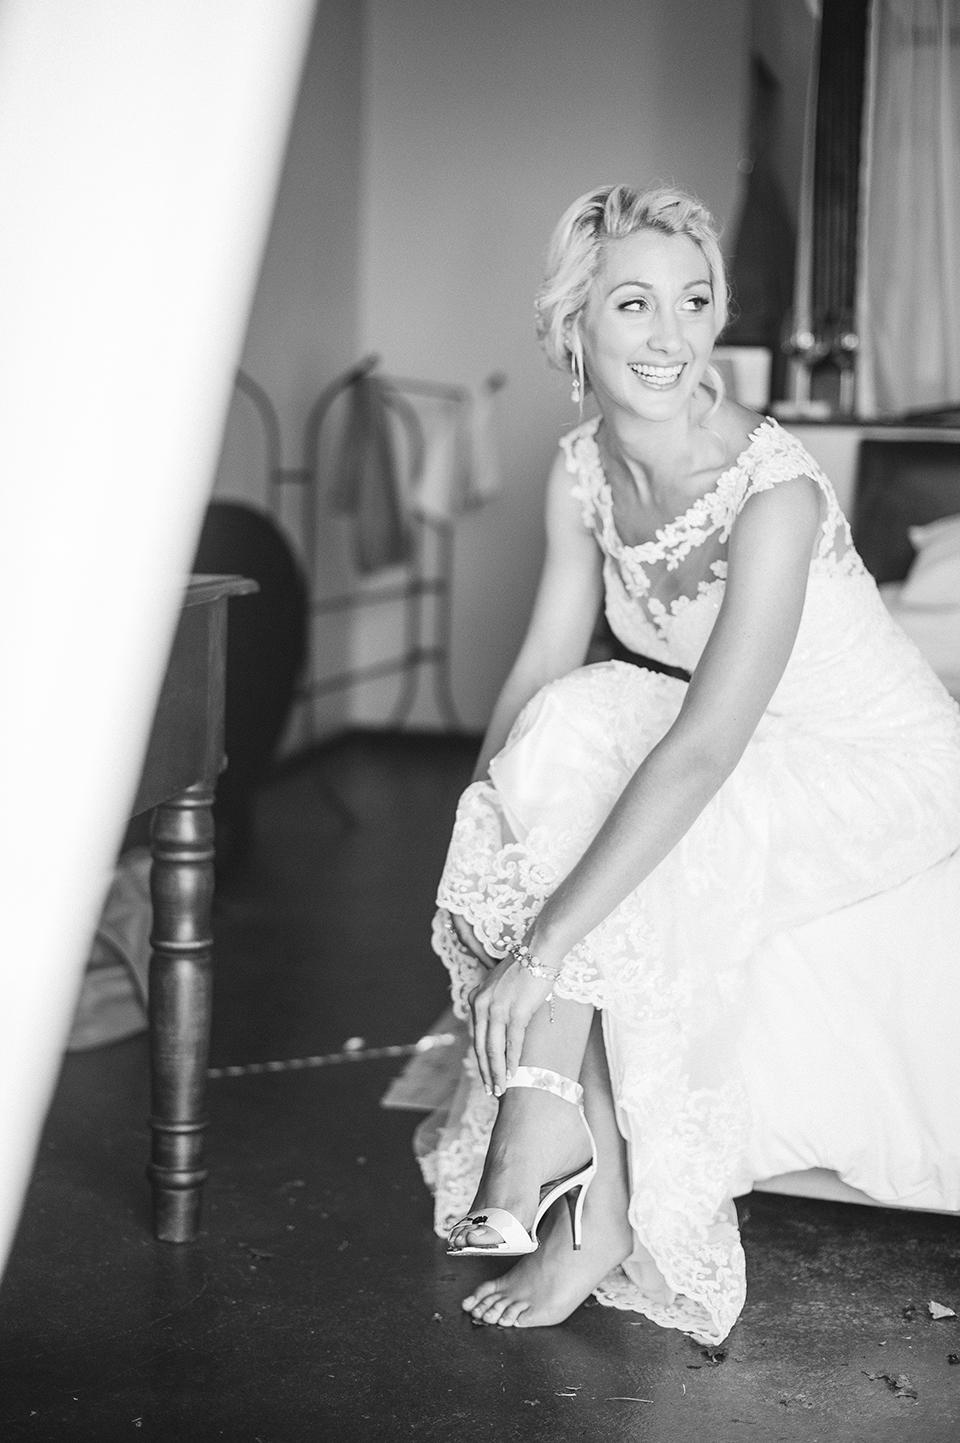 RyanParker_WeddingPhotographer_FineArt_CapeTown_Robertson_PatBusch_Hermanus_M&S_DSC_2906.jpg